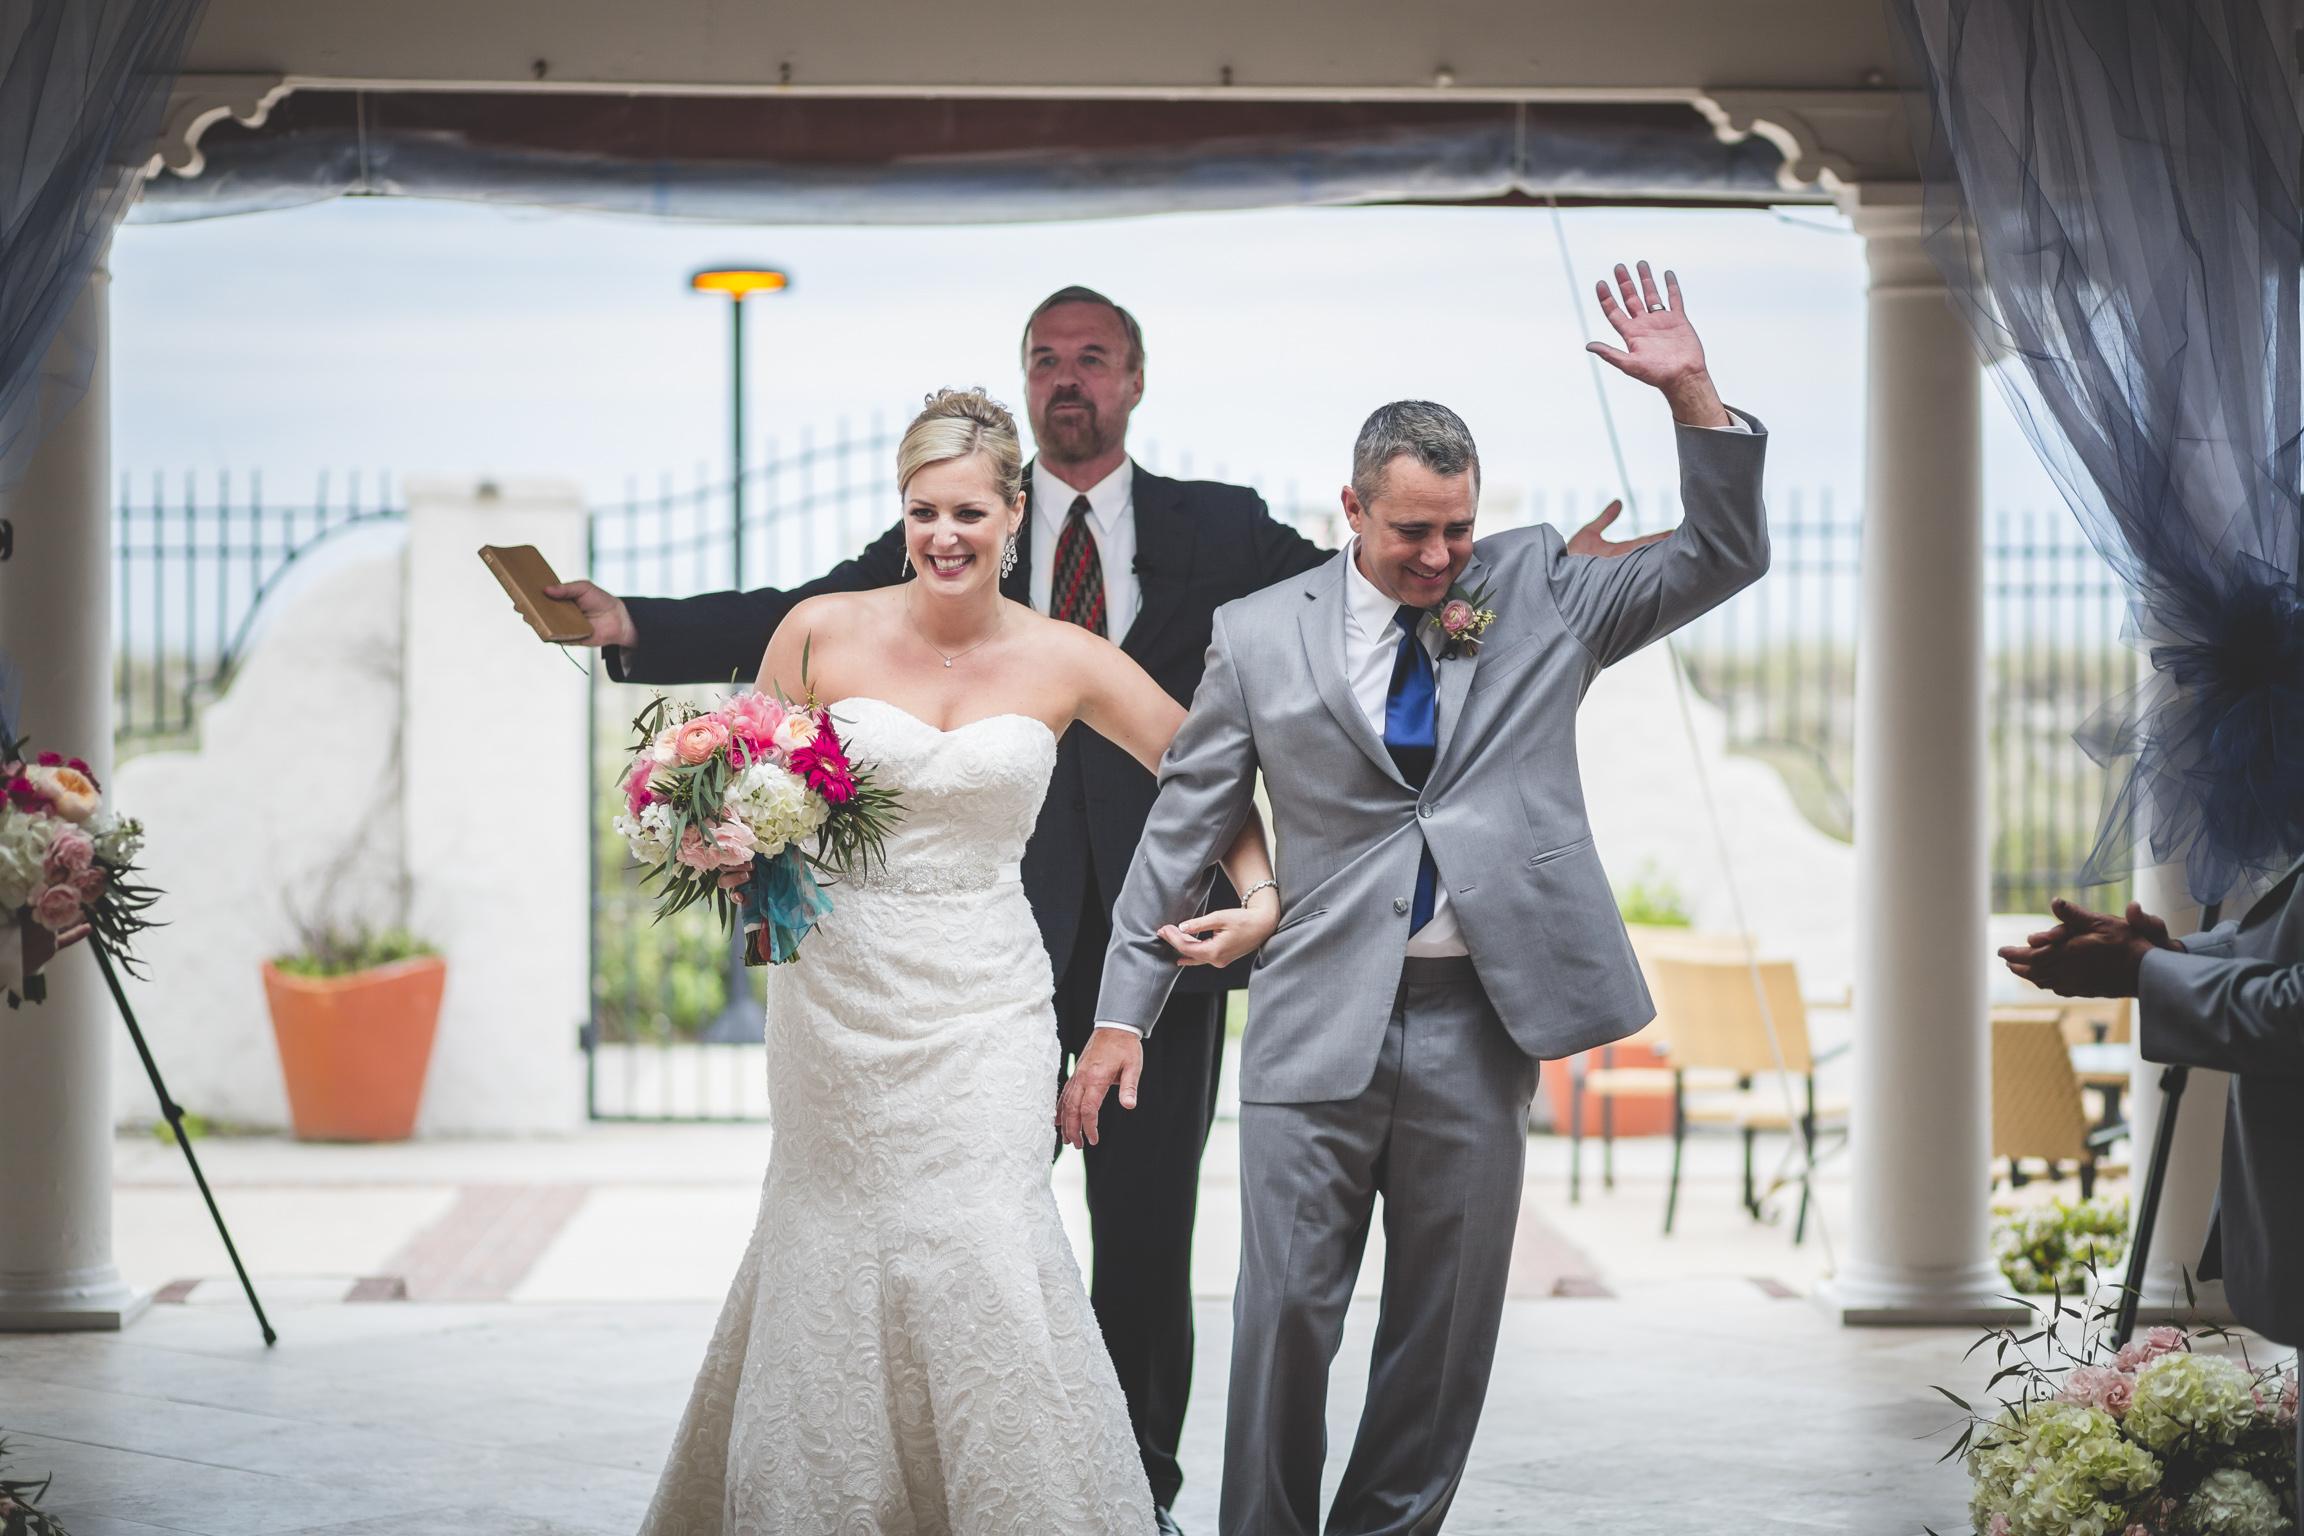 adam-szarmack-casa-marina-wedding-photographer-jacksonville-beach-florida-35.jpg